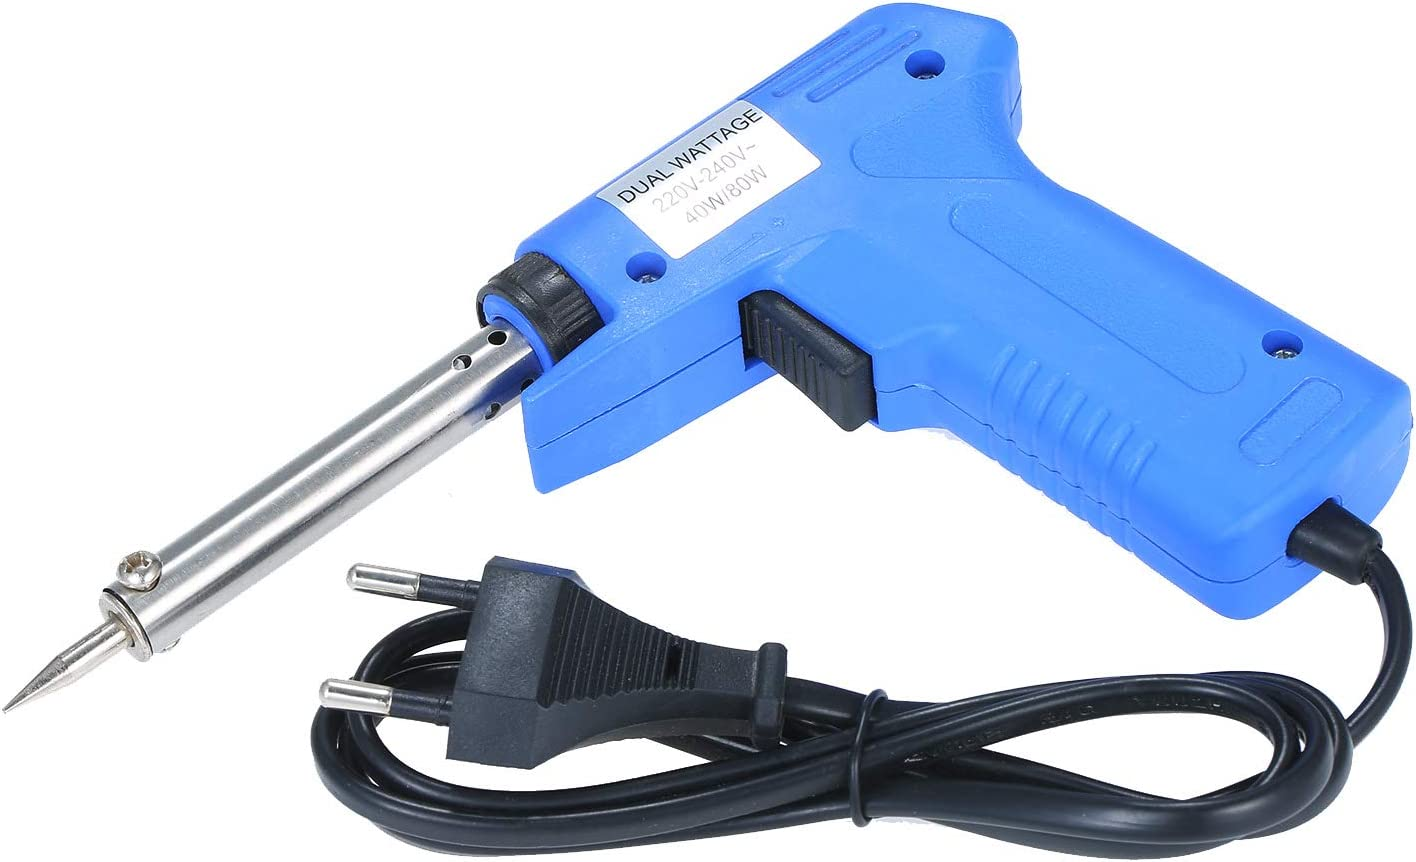 KKmoon Saldatore elettrico a doppia potenza Tipo di Pistola Saldatore elettrico Potenza regolabile Saldatore pistola Blu 40W//80W regolabile